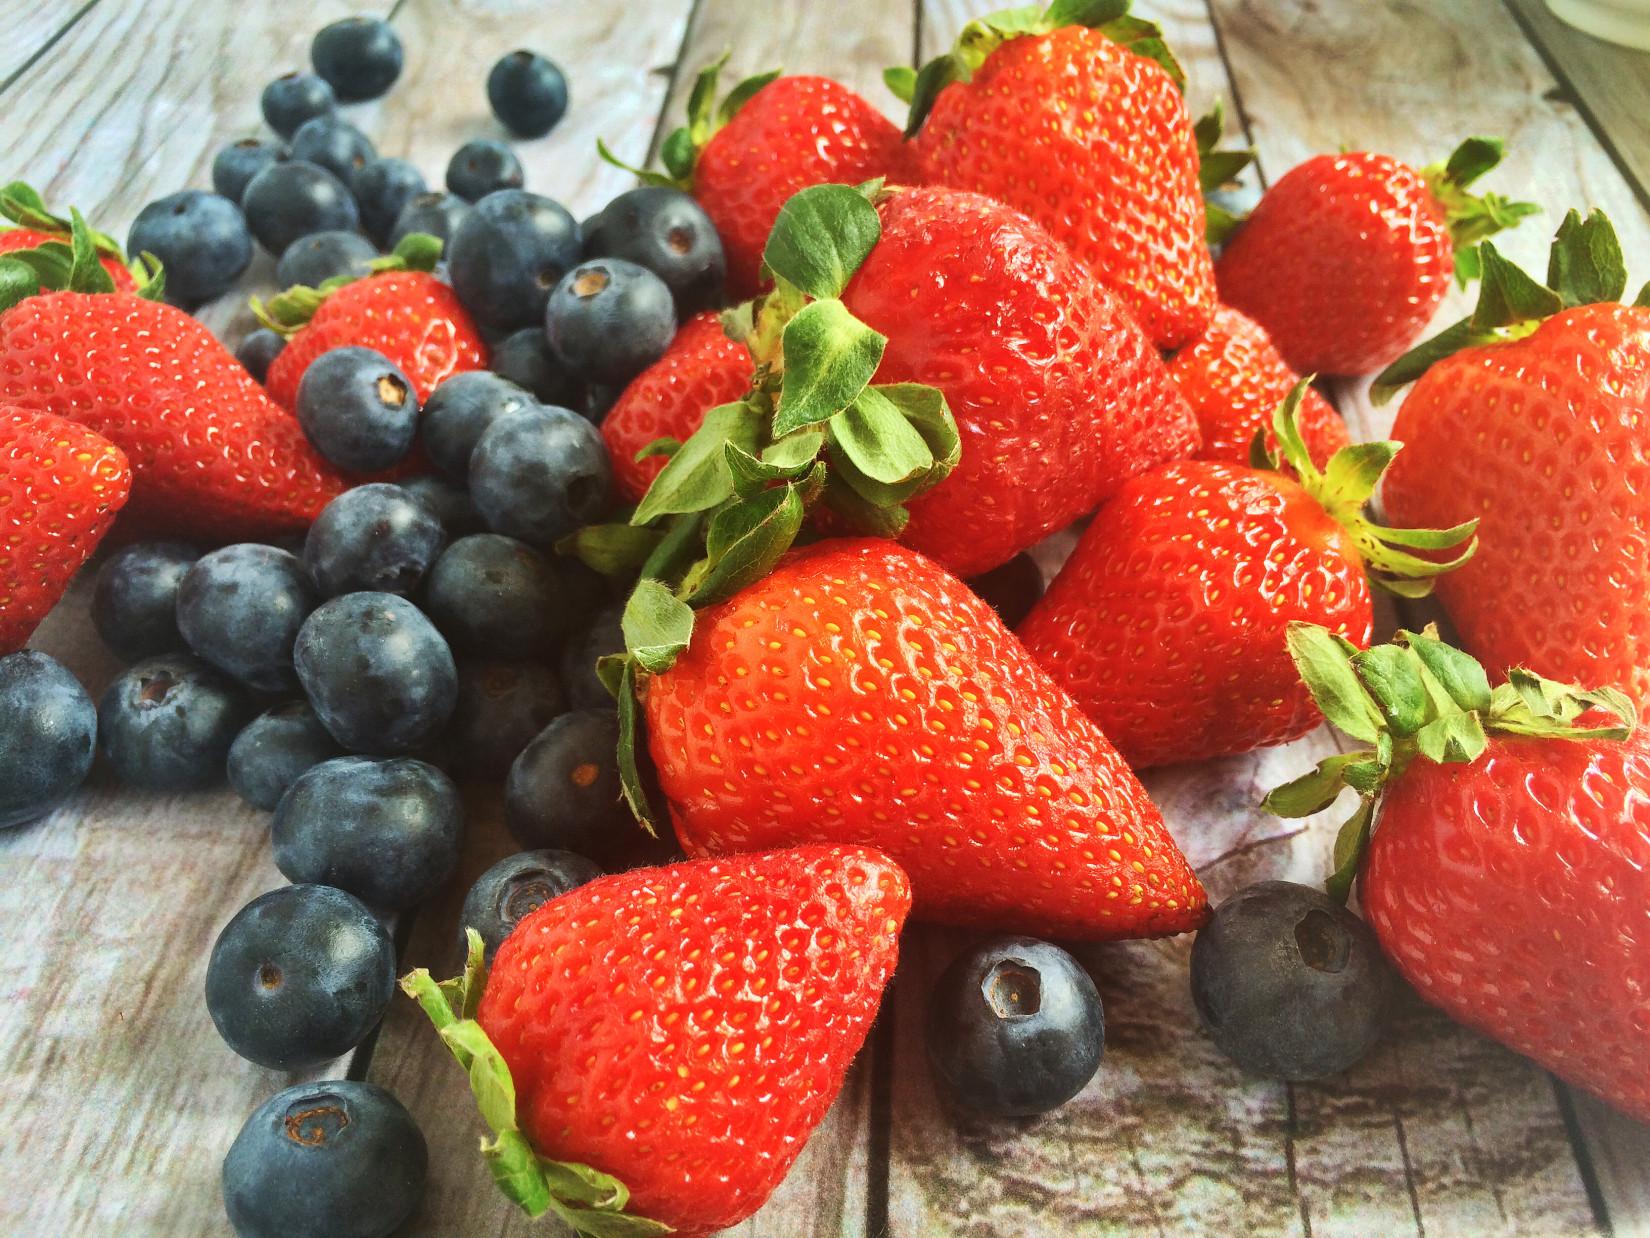 Straweberry_blueberry-e1410242054524.jpeg